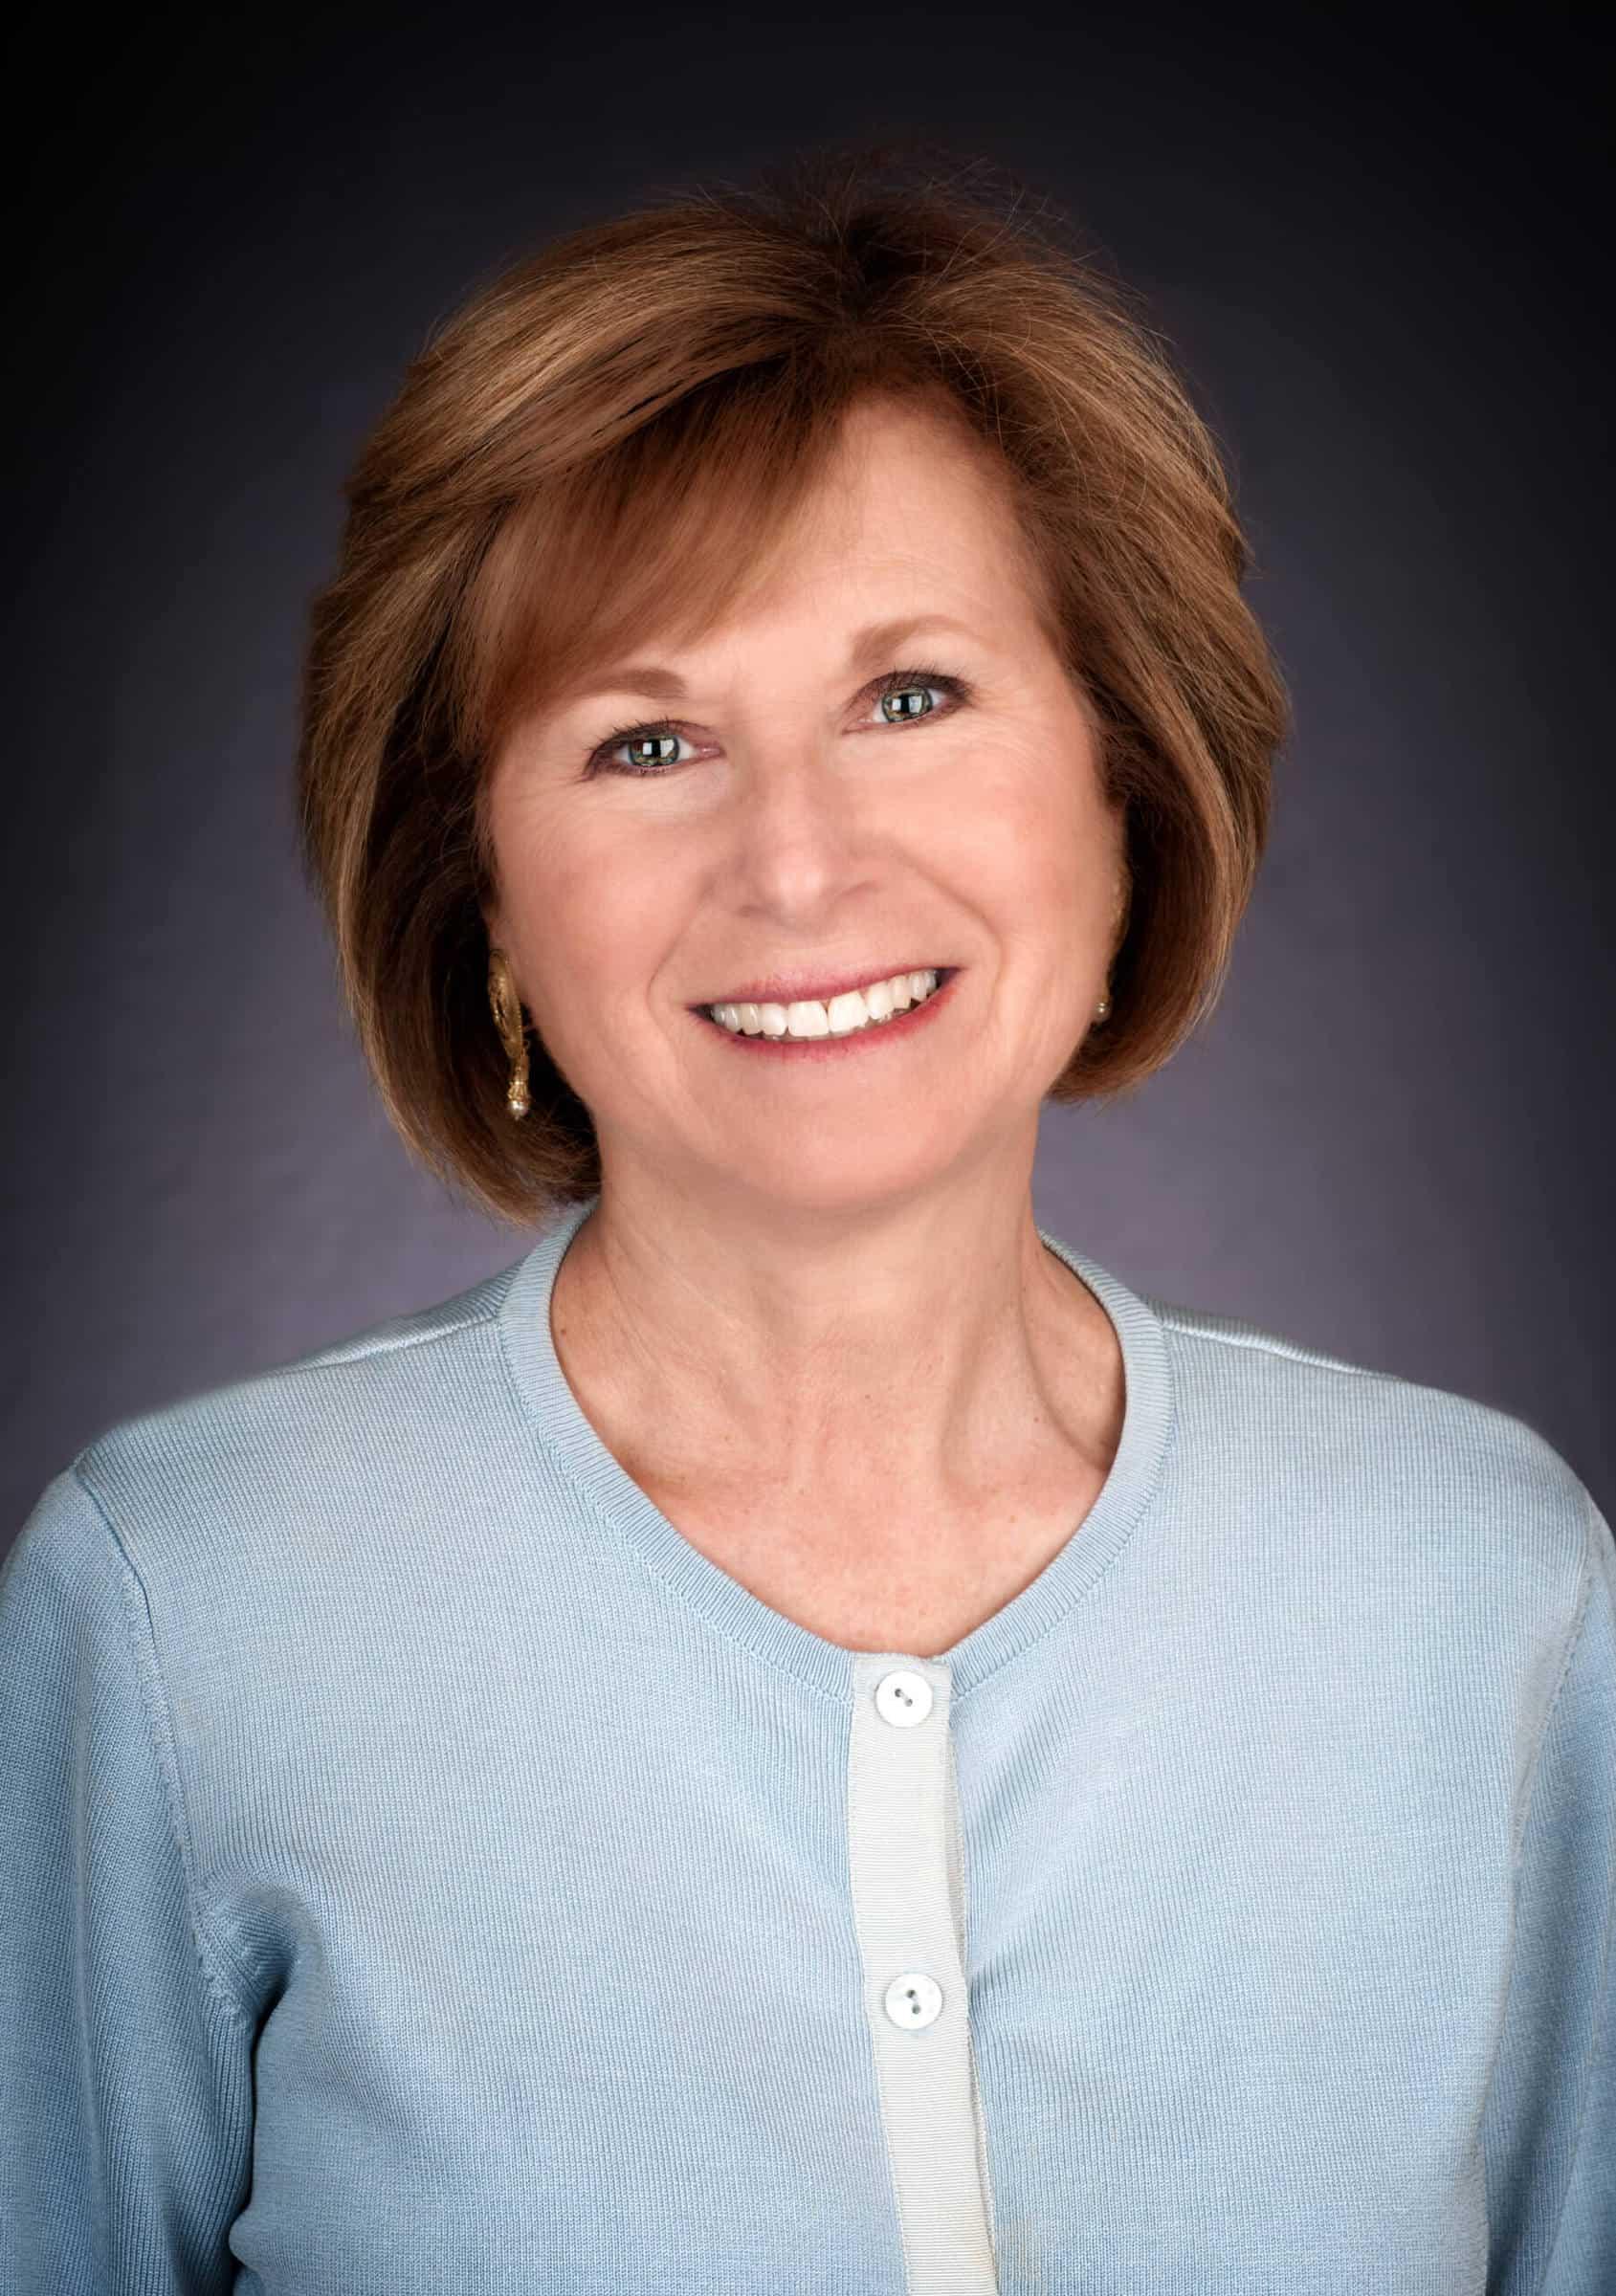 Debbie Silversmith Headshot